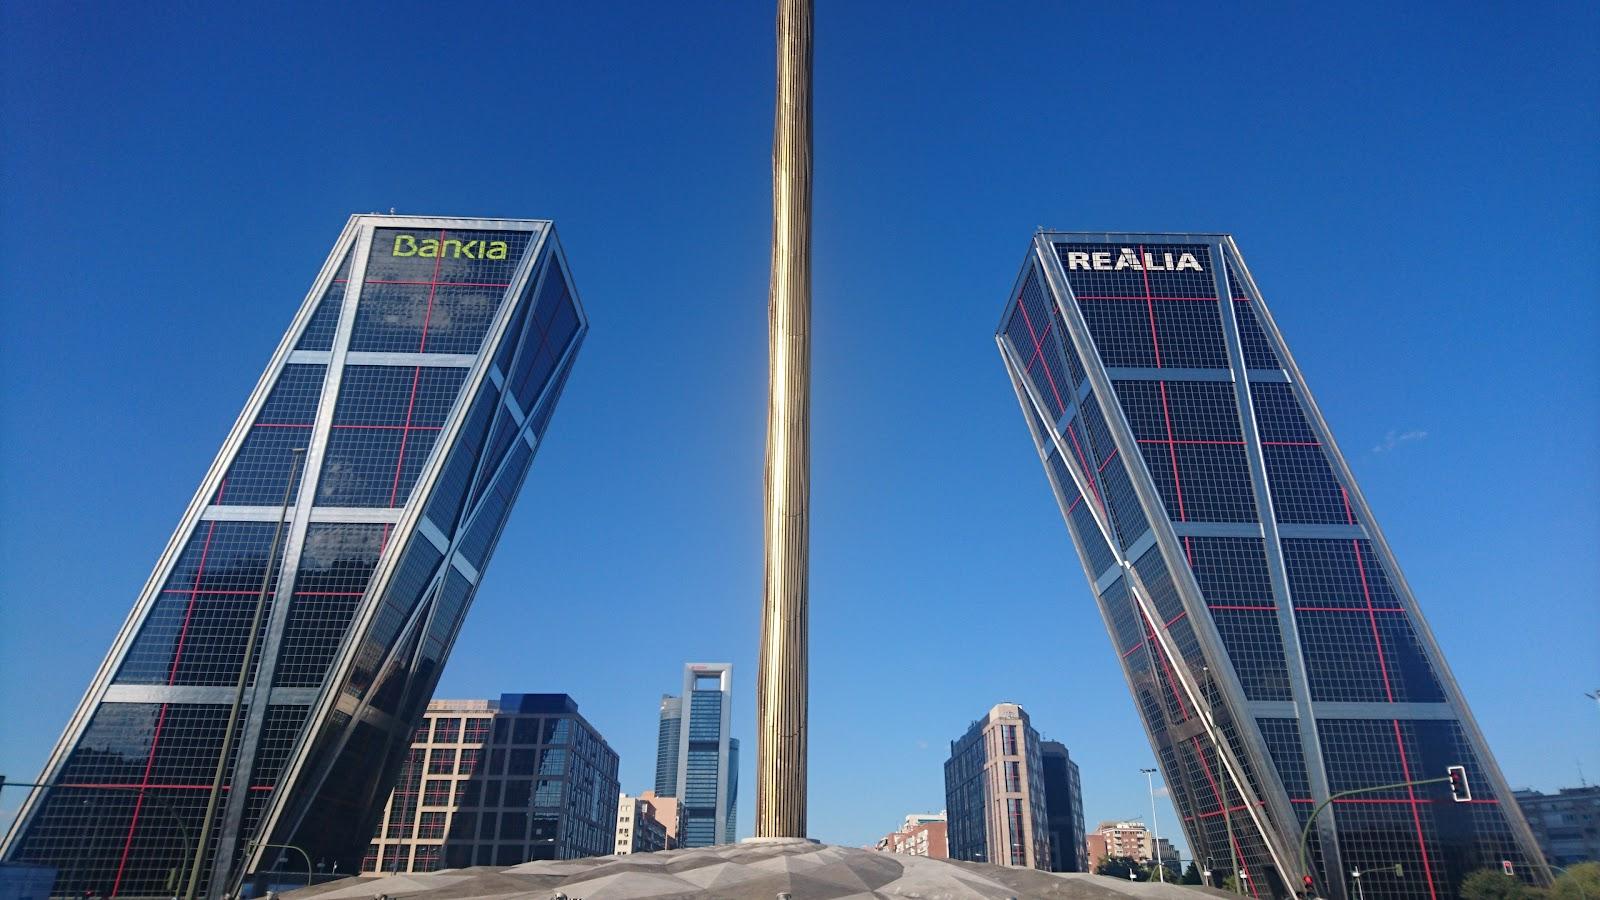 Torres kio madrid k x i i i - Torres kio arquitecto ...